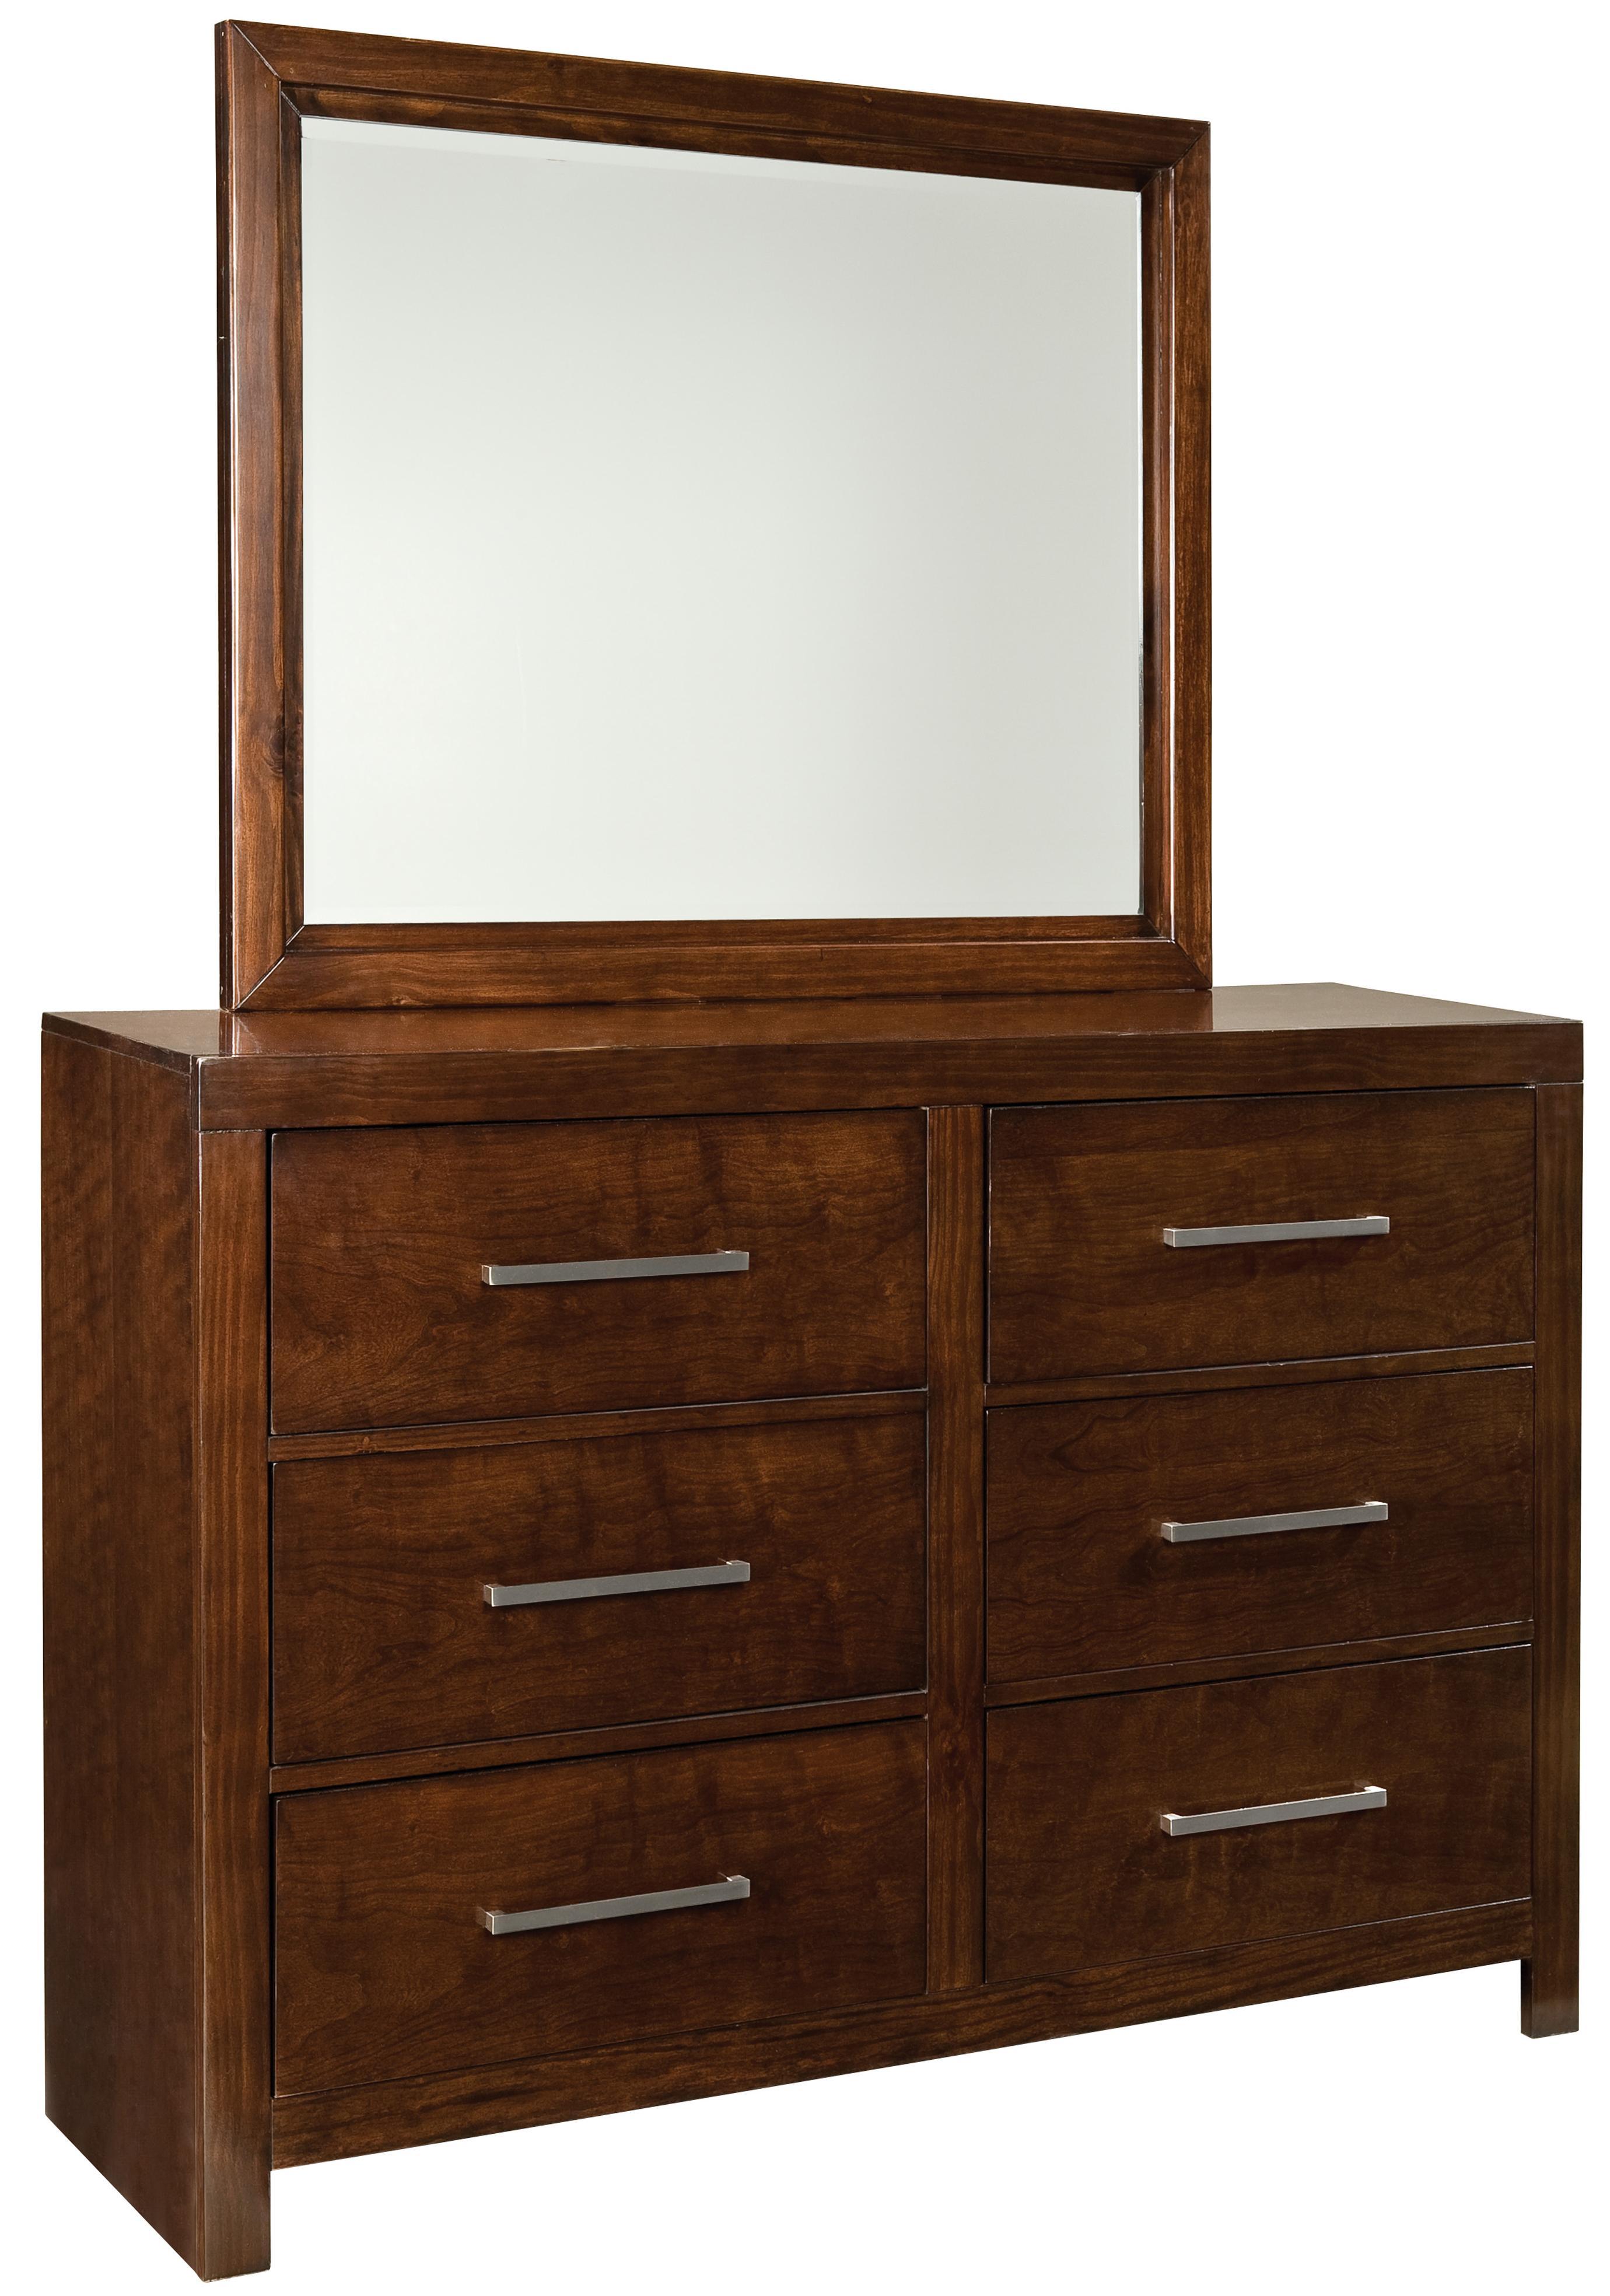 Standard Furniture Metro Dresser & Mirror Set - Item Number: 87959+58